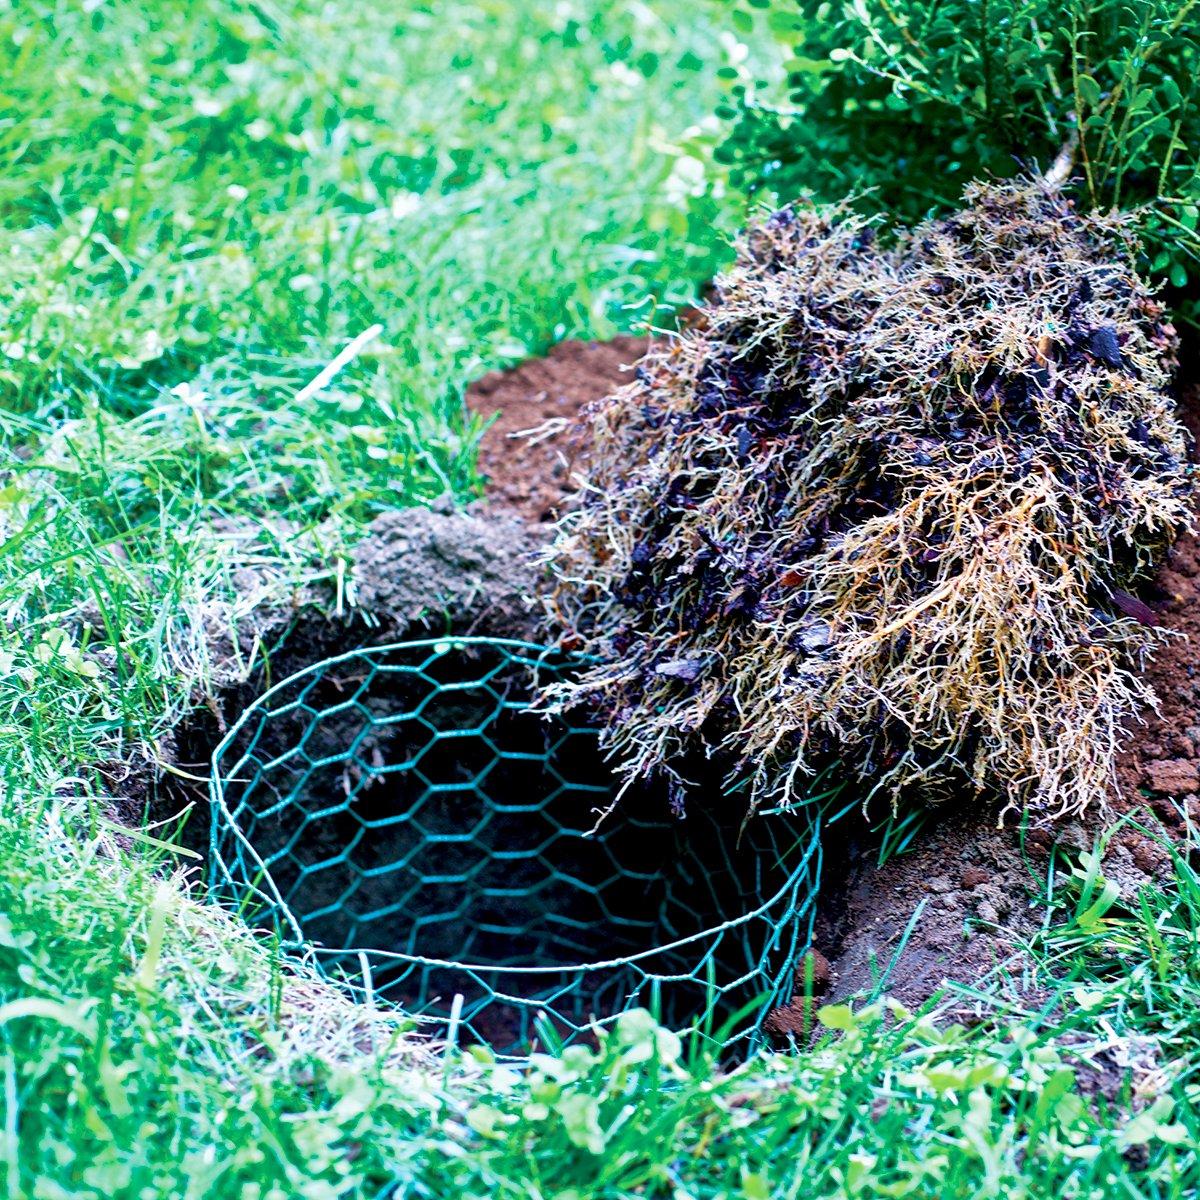 Garden Zone 24inx25ft 1in Green Vinyl Poultry Netting by Origin Point (Image #5)